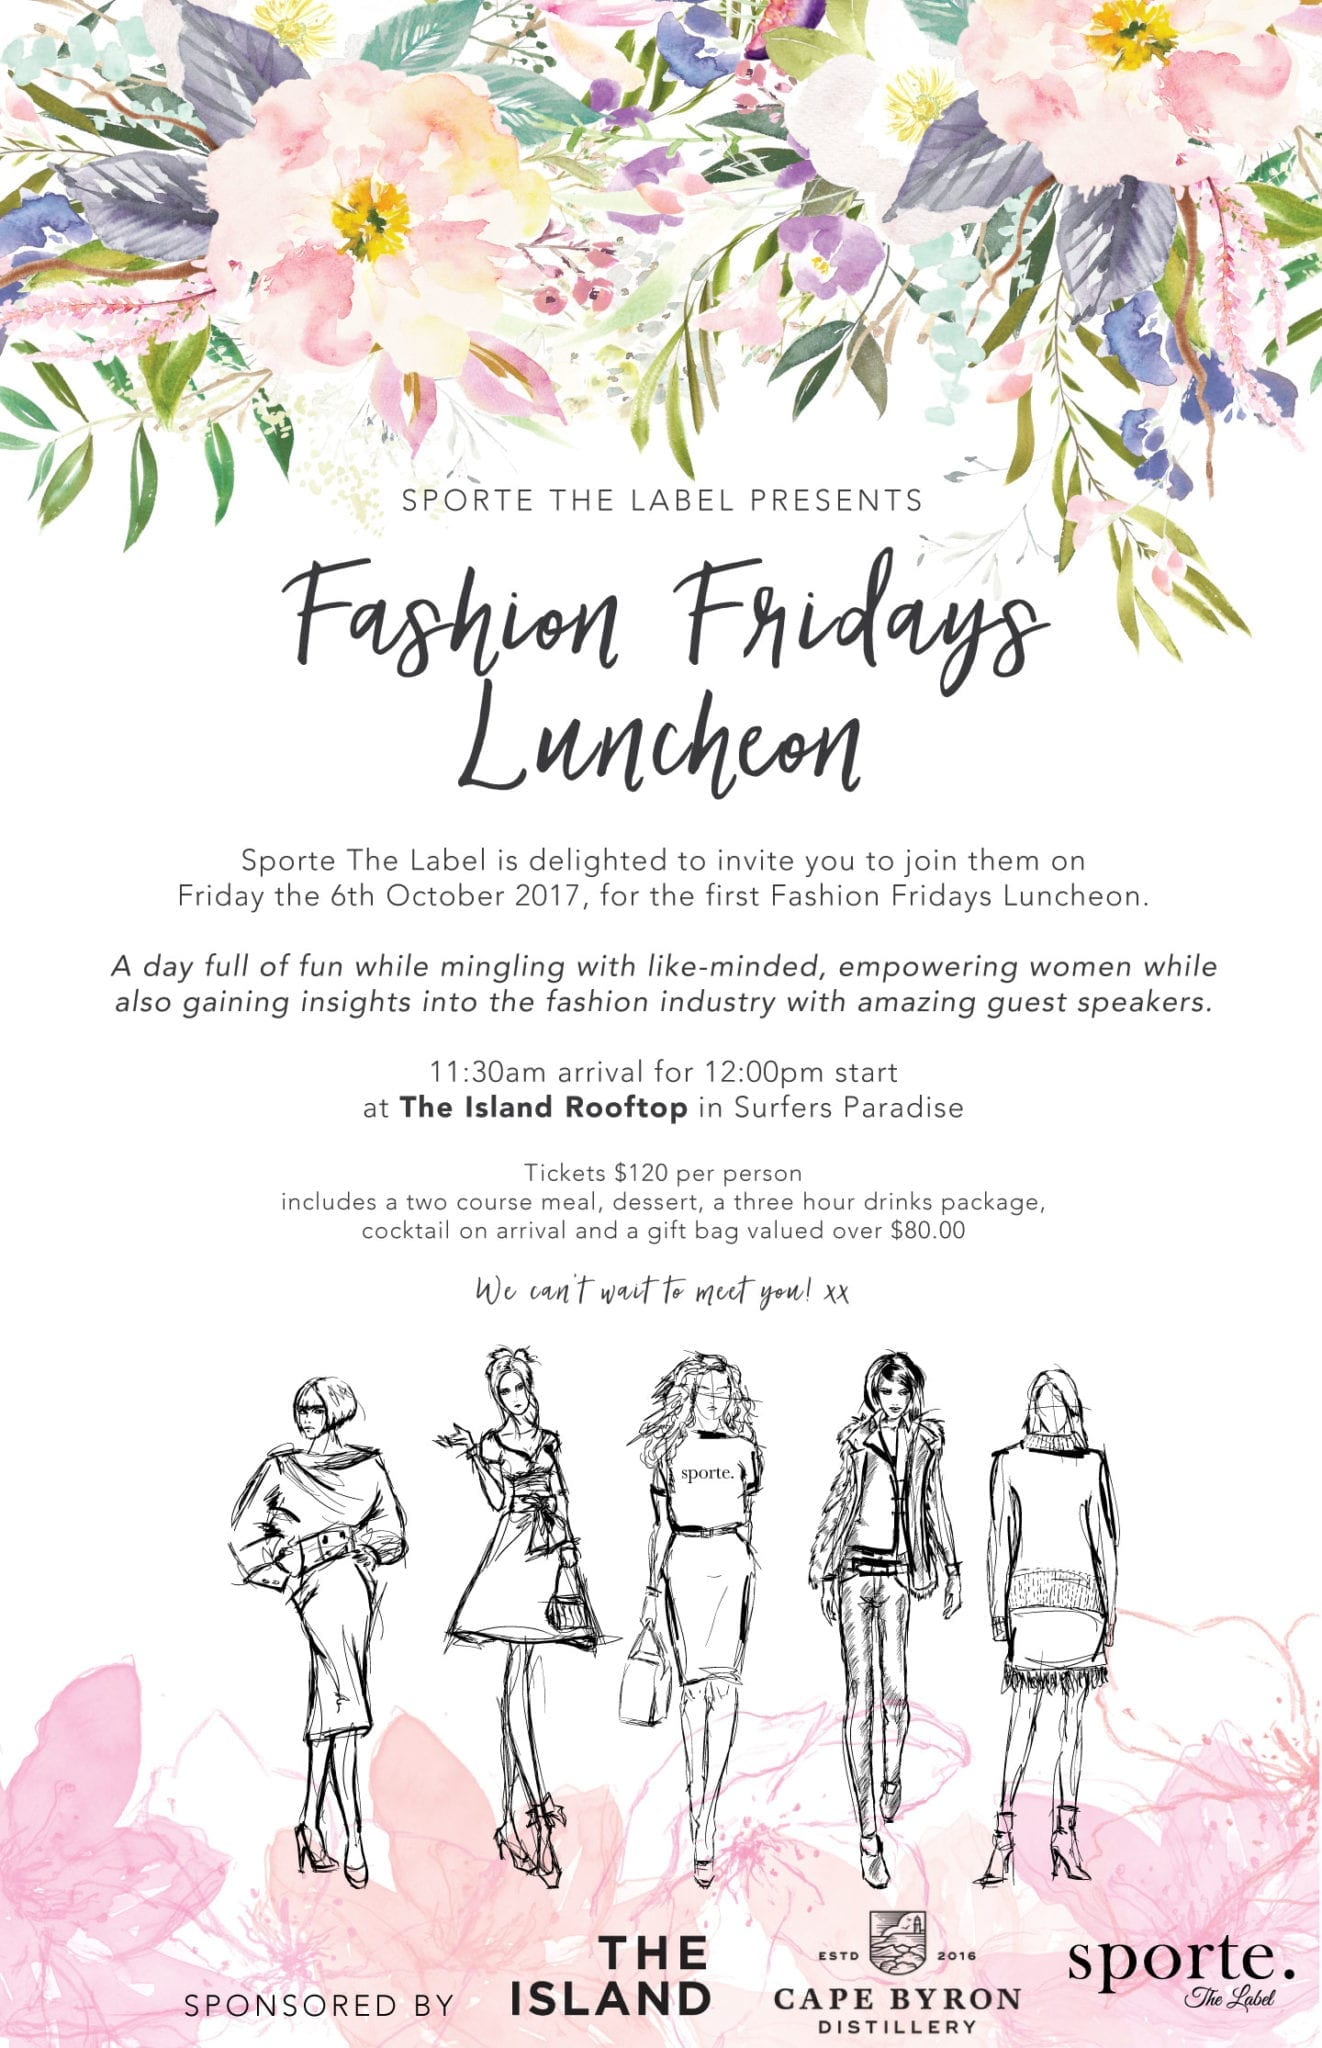 The Island - Fashion Fridays Luncheon [object object] - IMG 1621 - FASHION FRIDAYS LUNCHEON